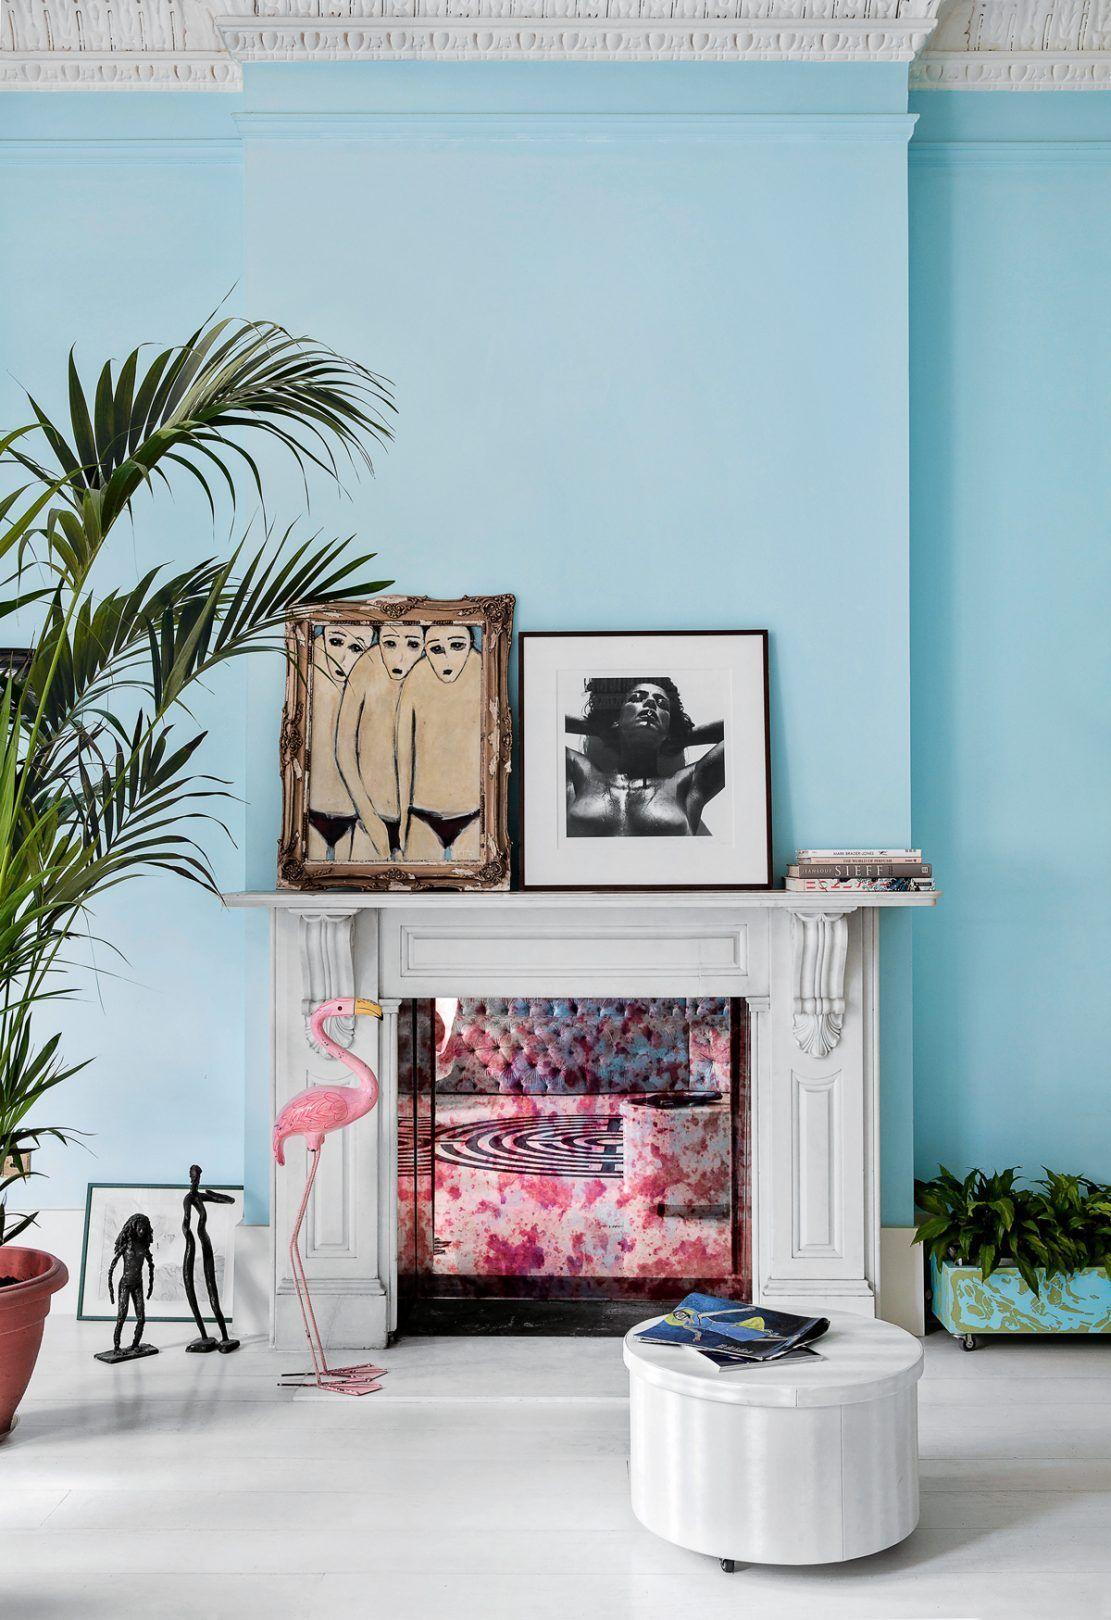 New elegance livingetc home decor ideas in house